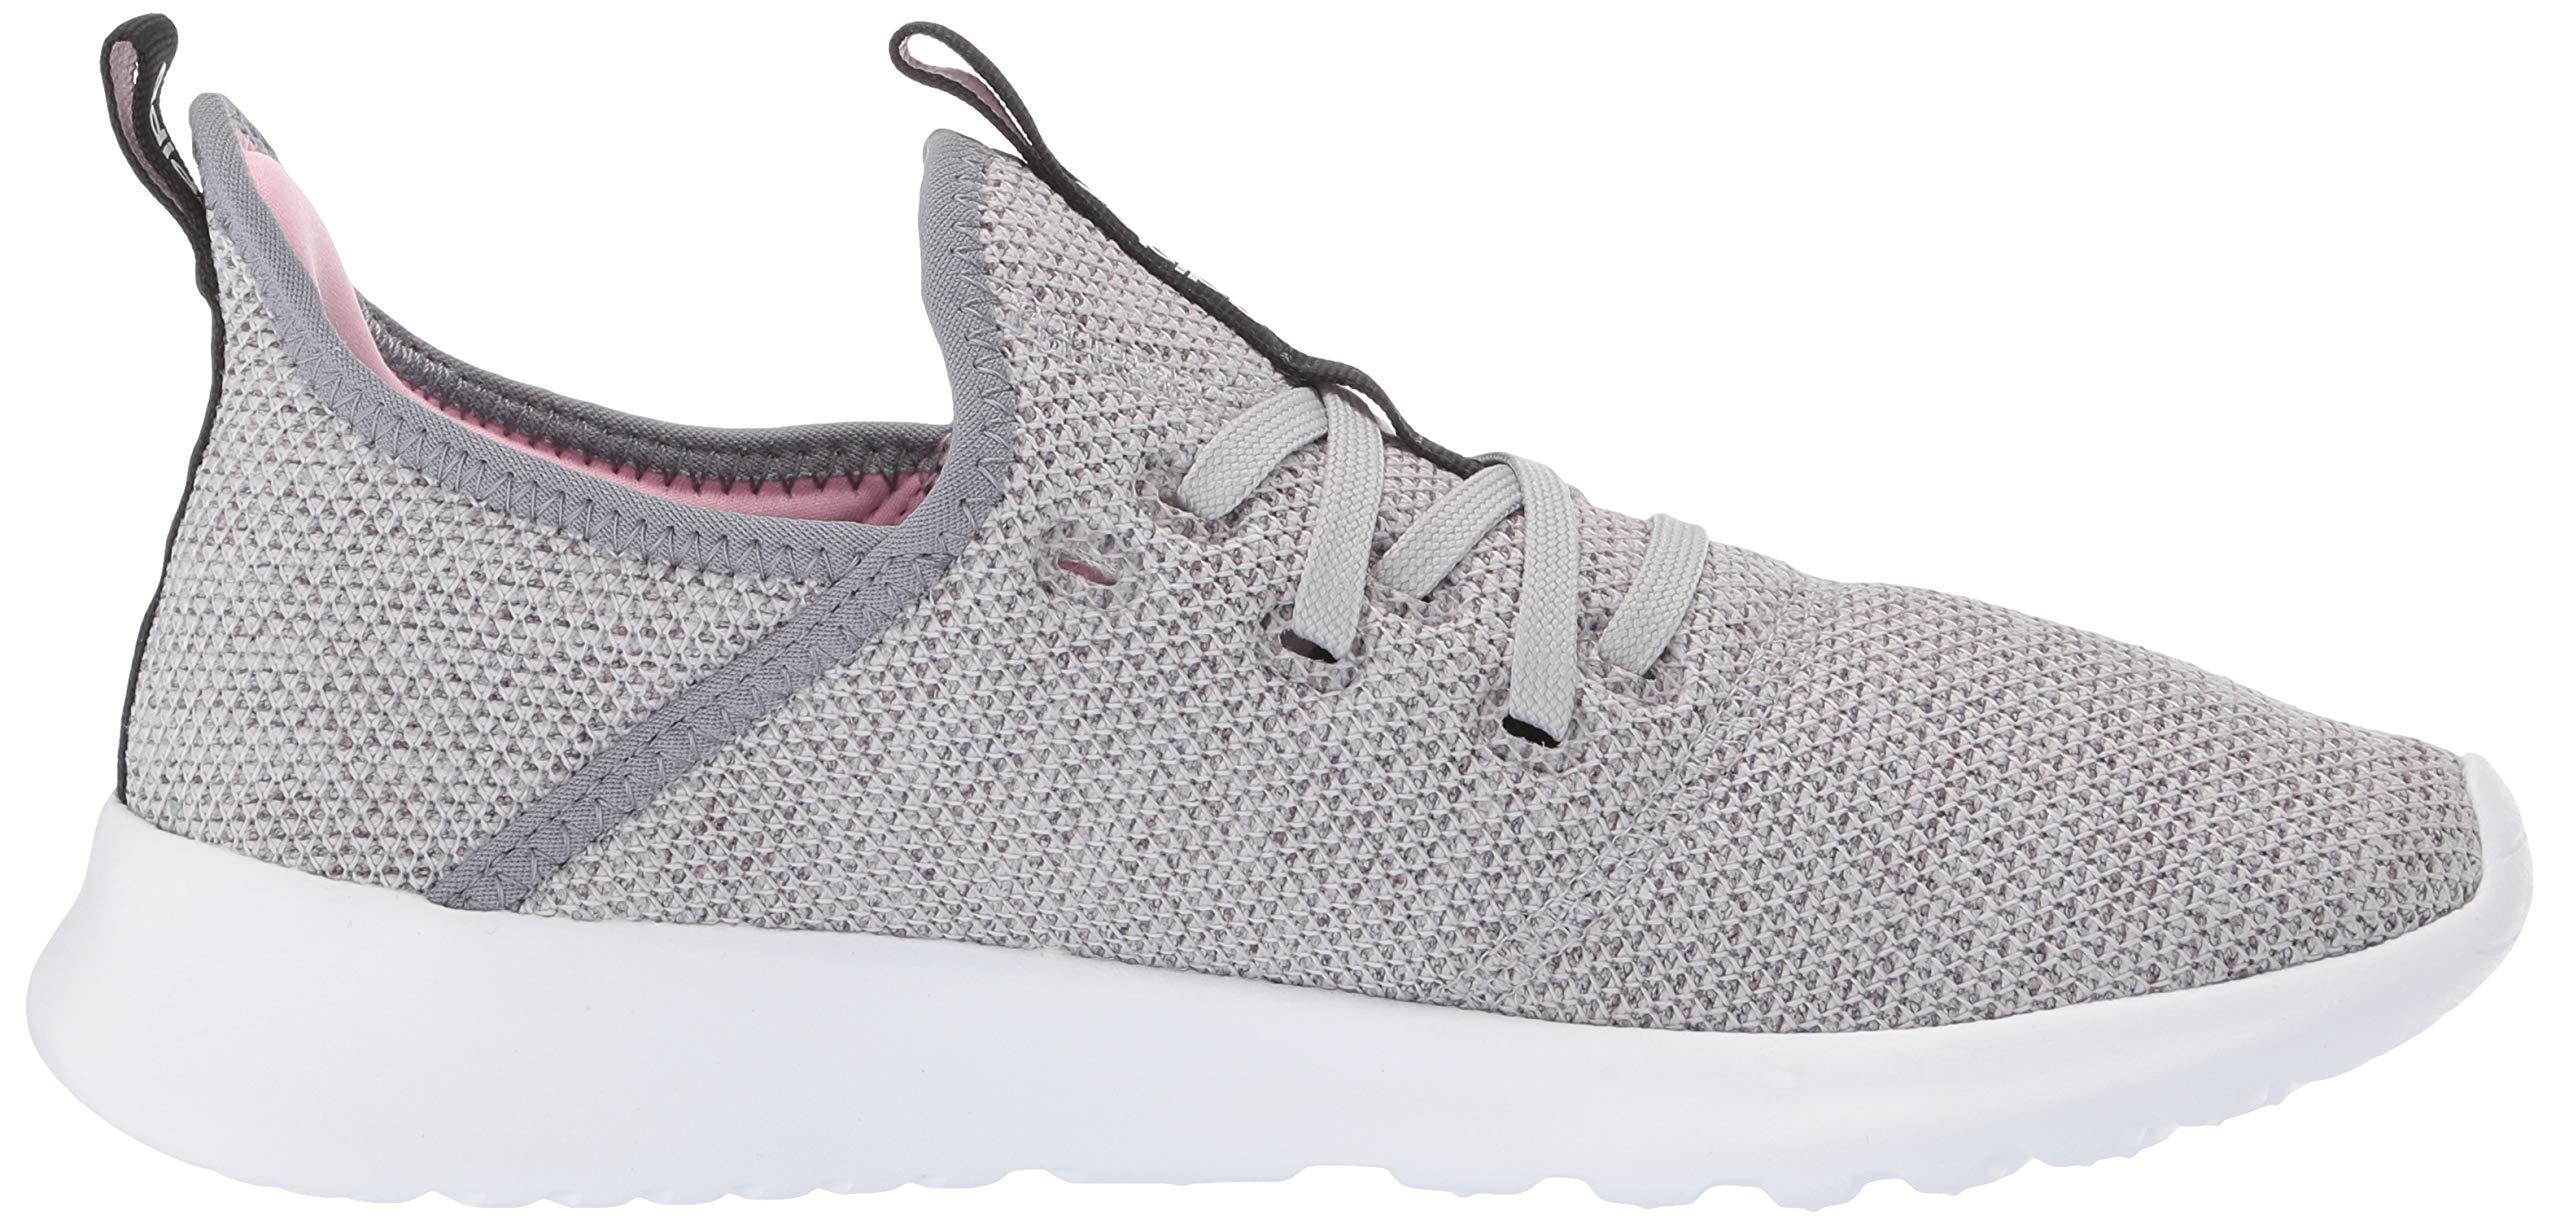 adidas Women's Cloudfoam Pure, Grey/True Pink, 5.5 M US by adidas (Image #7)